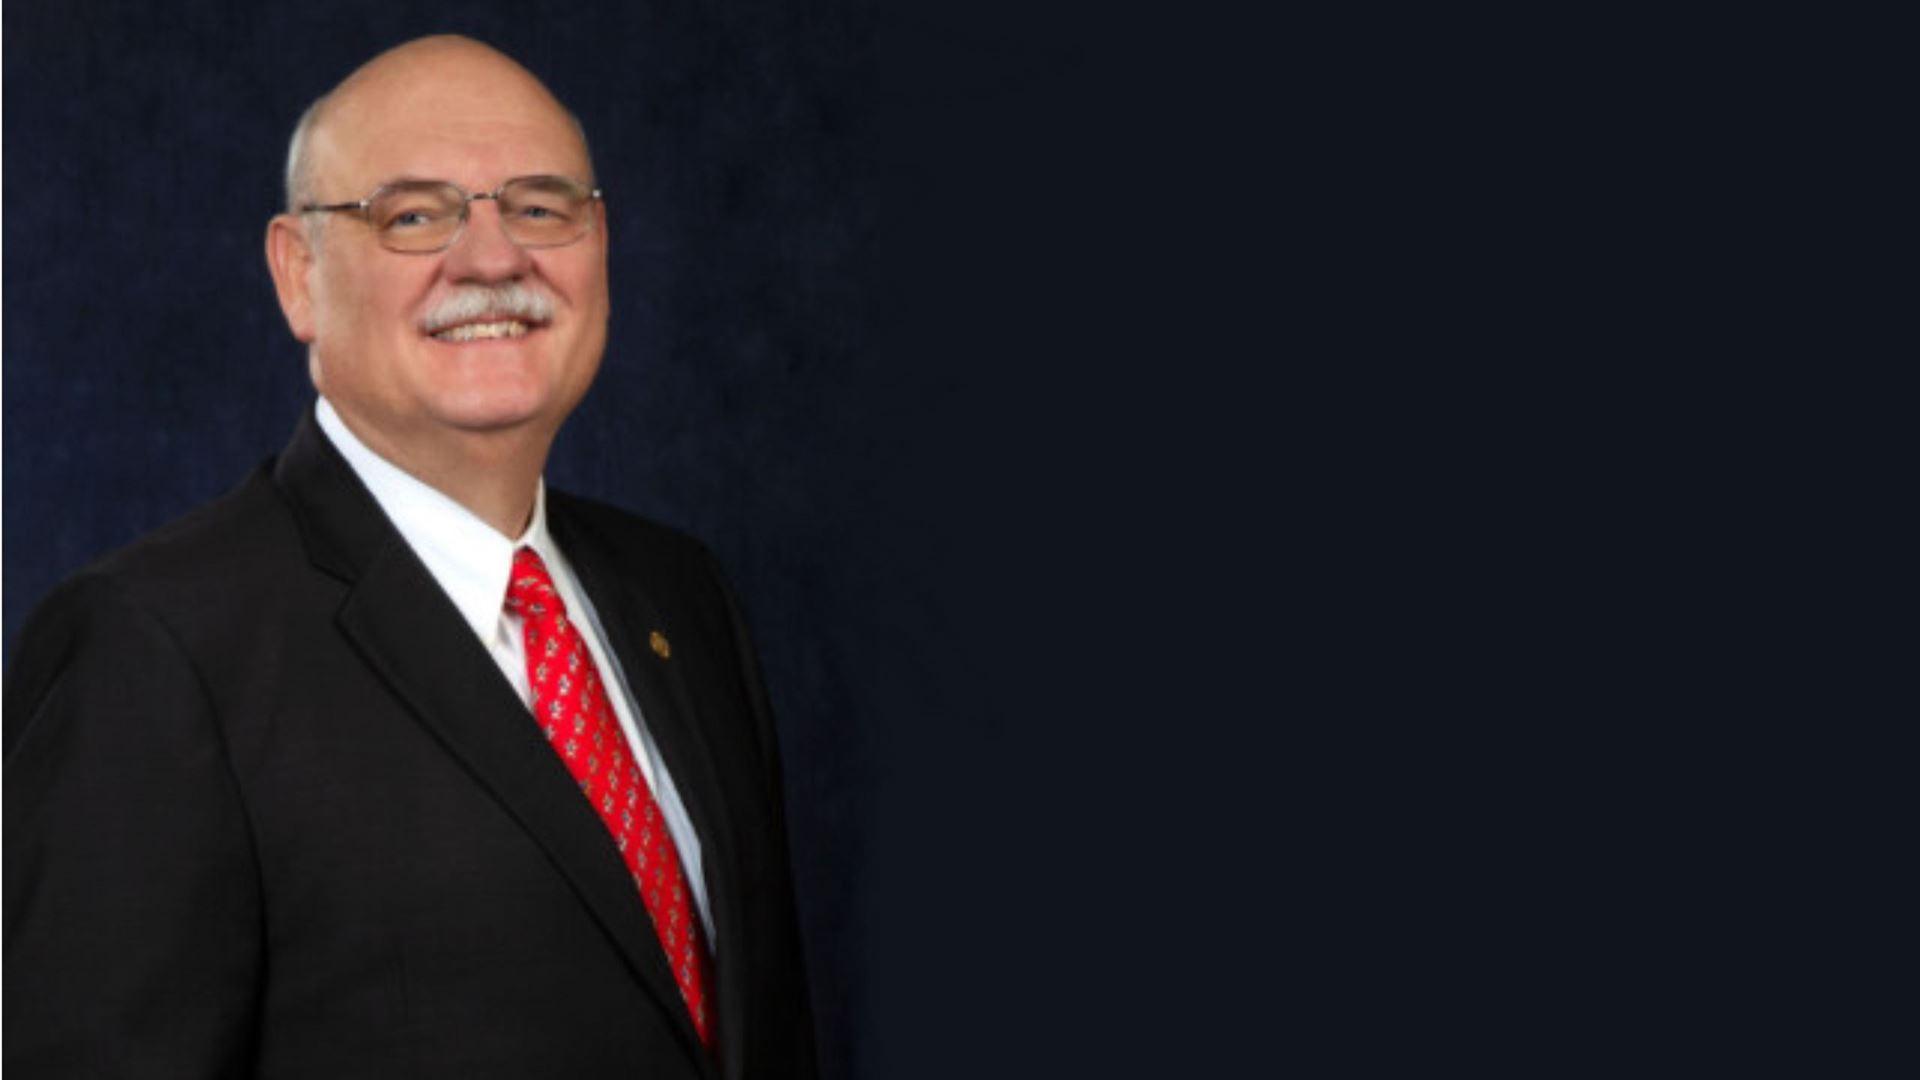 Patrick Godbey, MD, FCAP, CAP President (2019-2021)